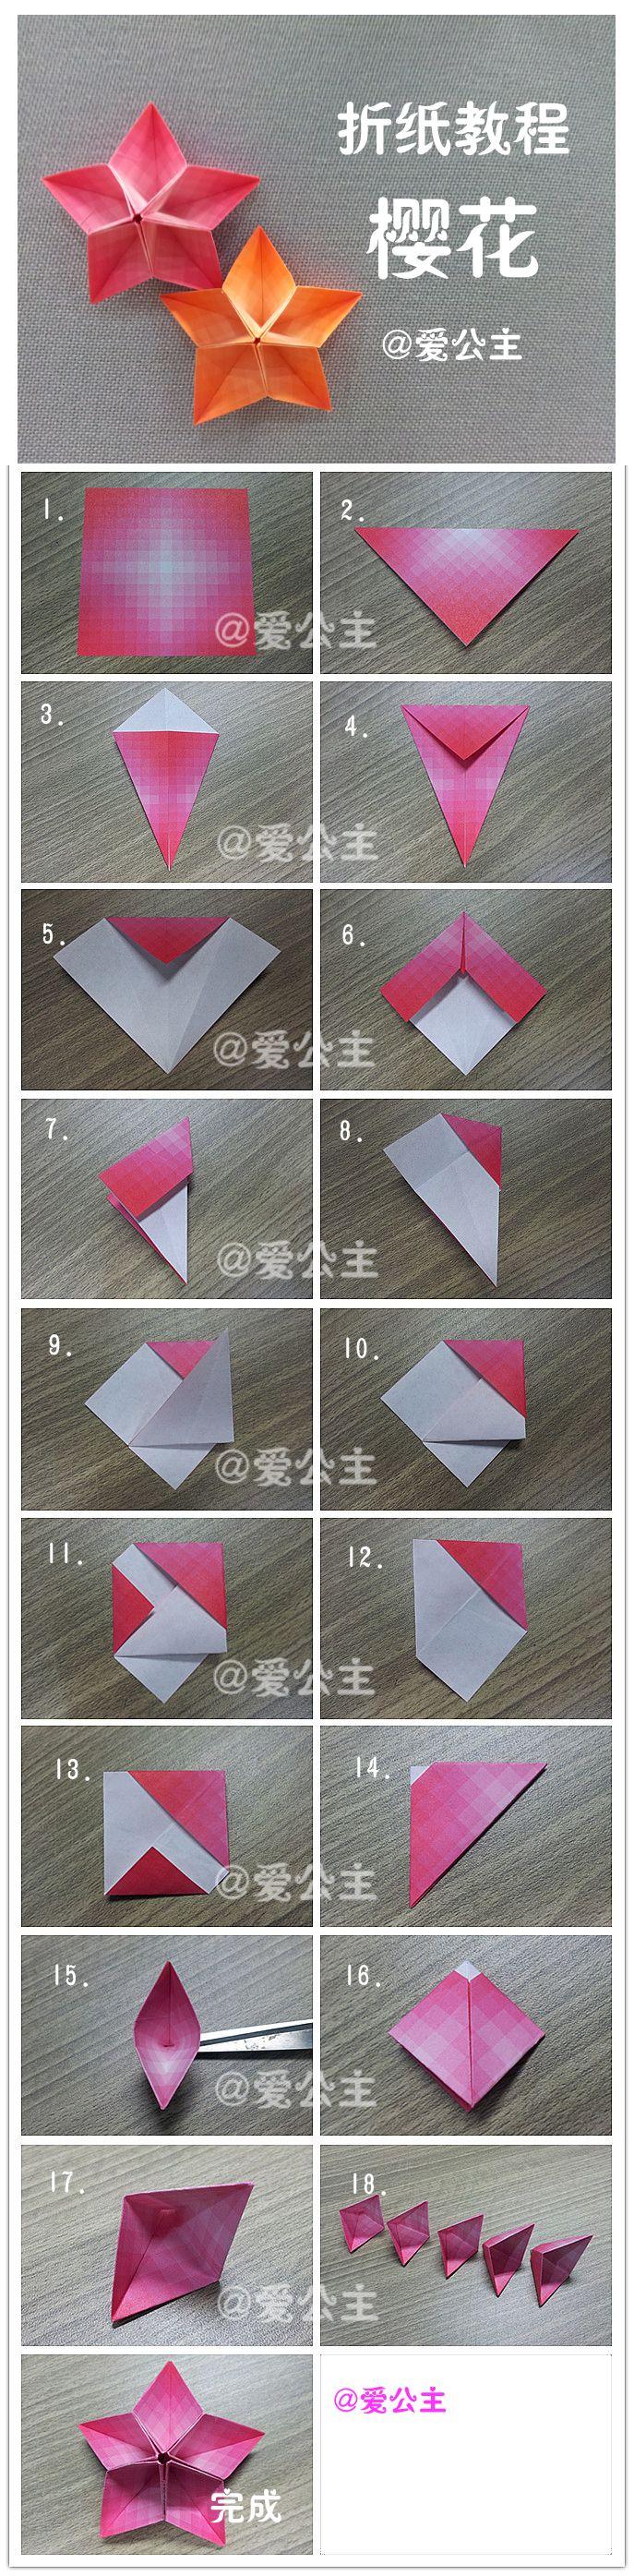 35aaa1803a77ddf6c4ad45c595c15c86g 6872790 Origami